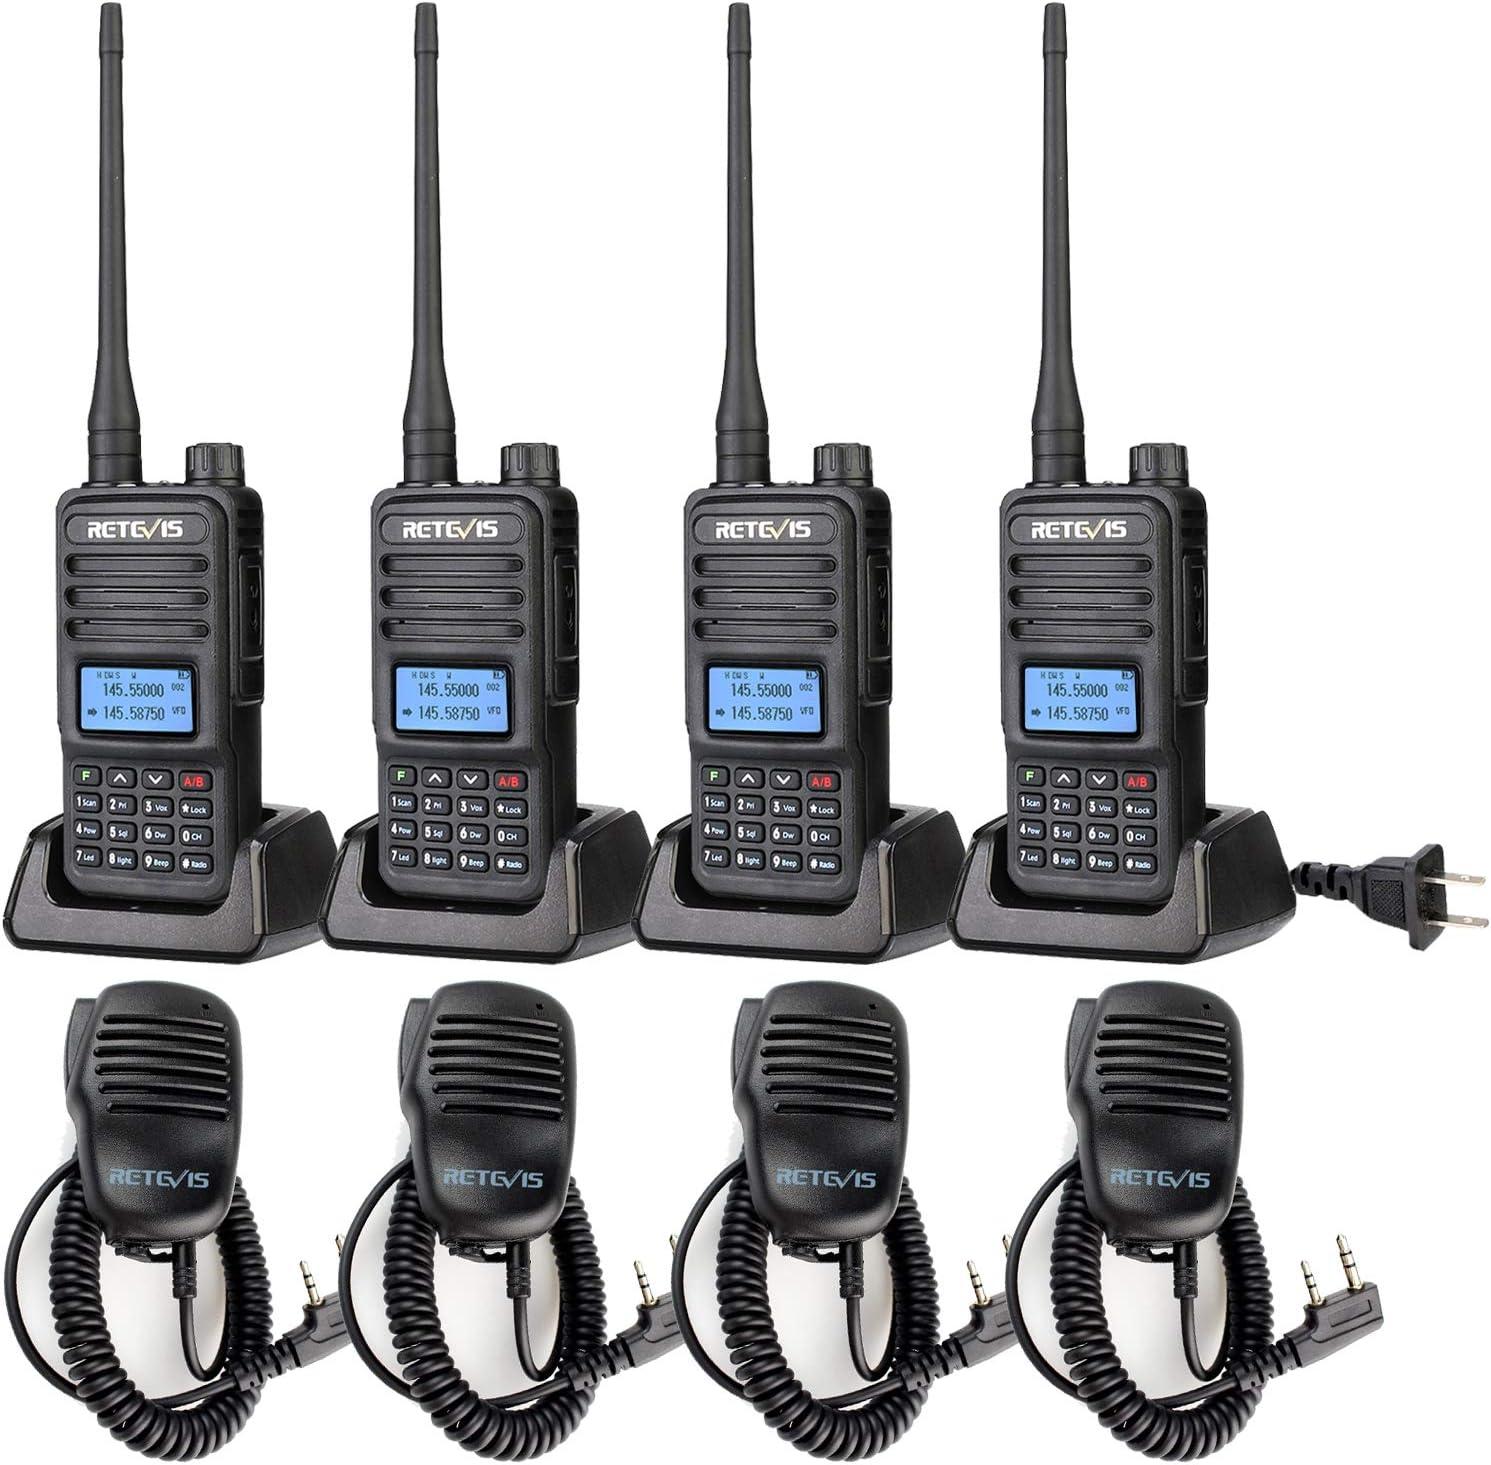 Retevis RT85 Dual Band 2 Way Radios,Adults Walkie Talkies Long Range,High Power Two Way Radios,VOX Remote Stun ANI Handheld Speaker Mic(4 Pack)